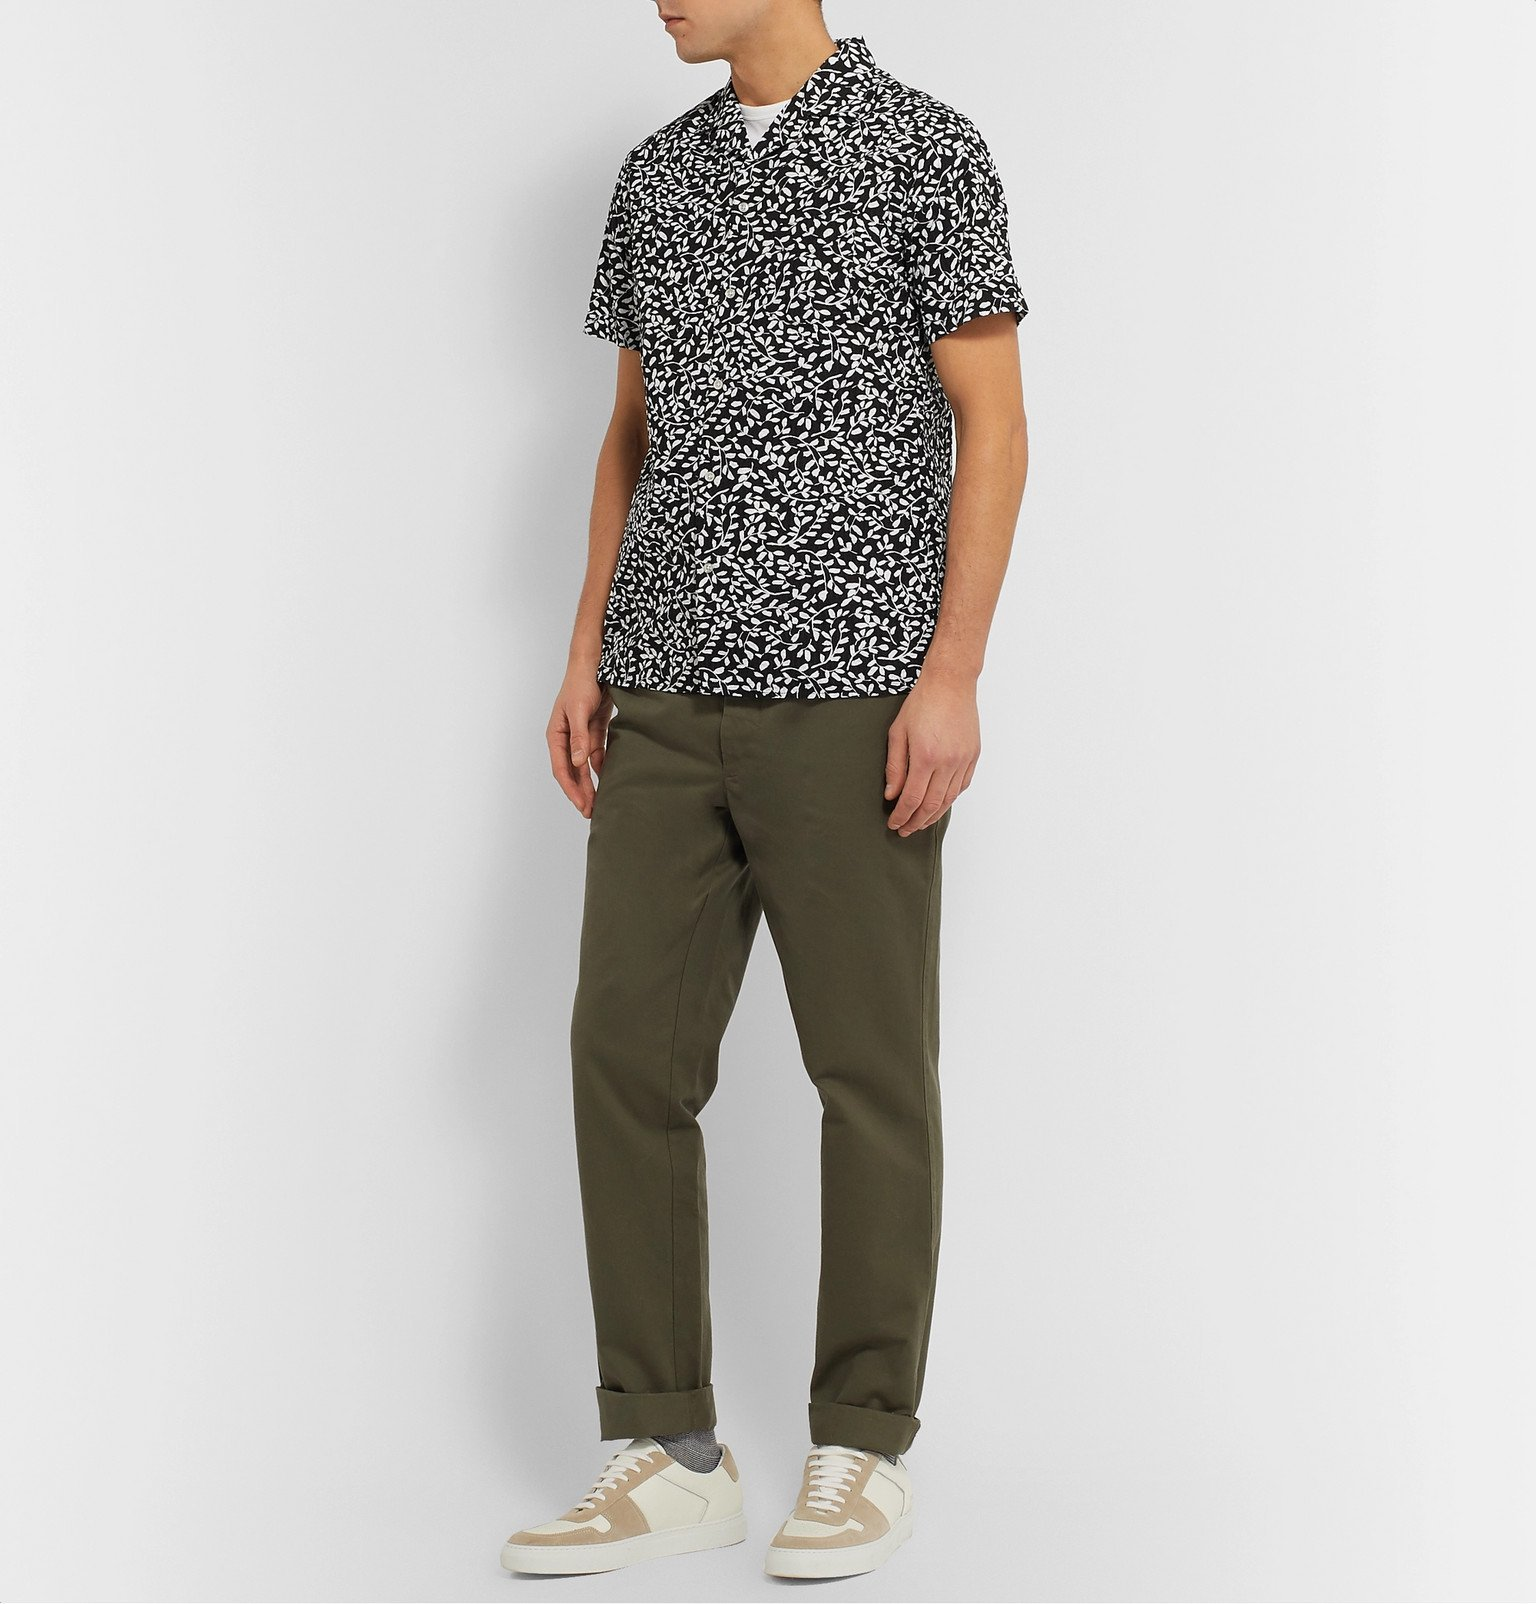 Officine Generale - Dario Slim-Fit Camp-Collar Printed Cotton-Seersucker Shirt - Black